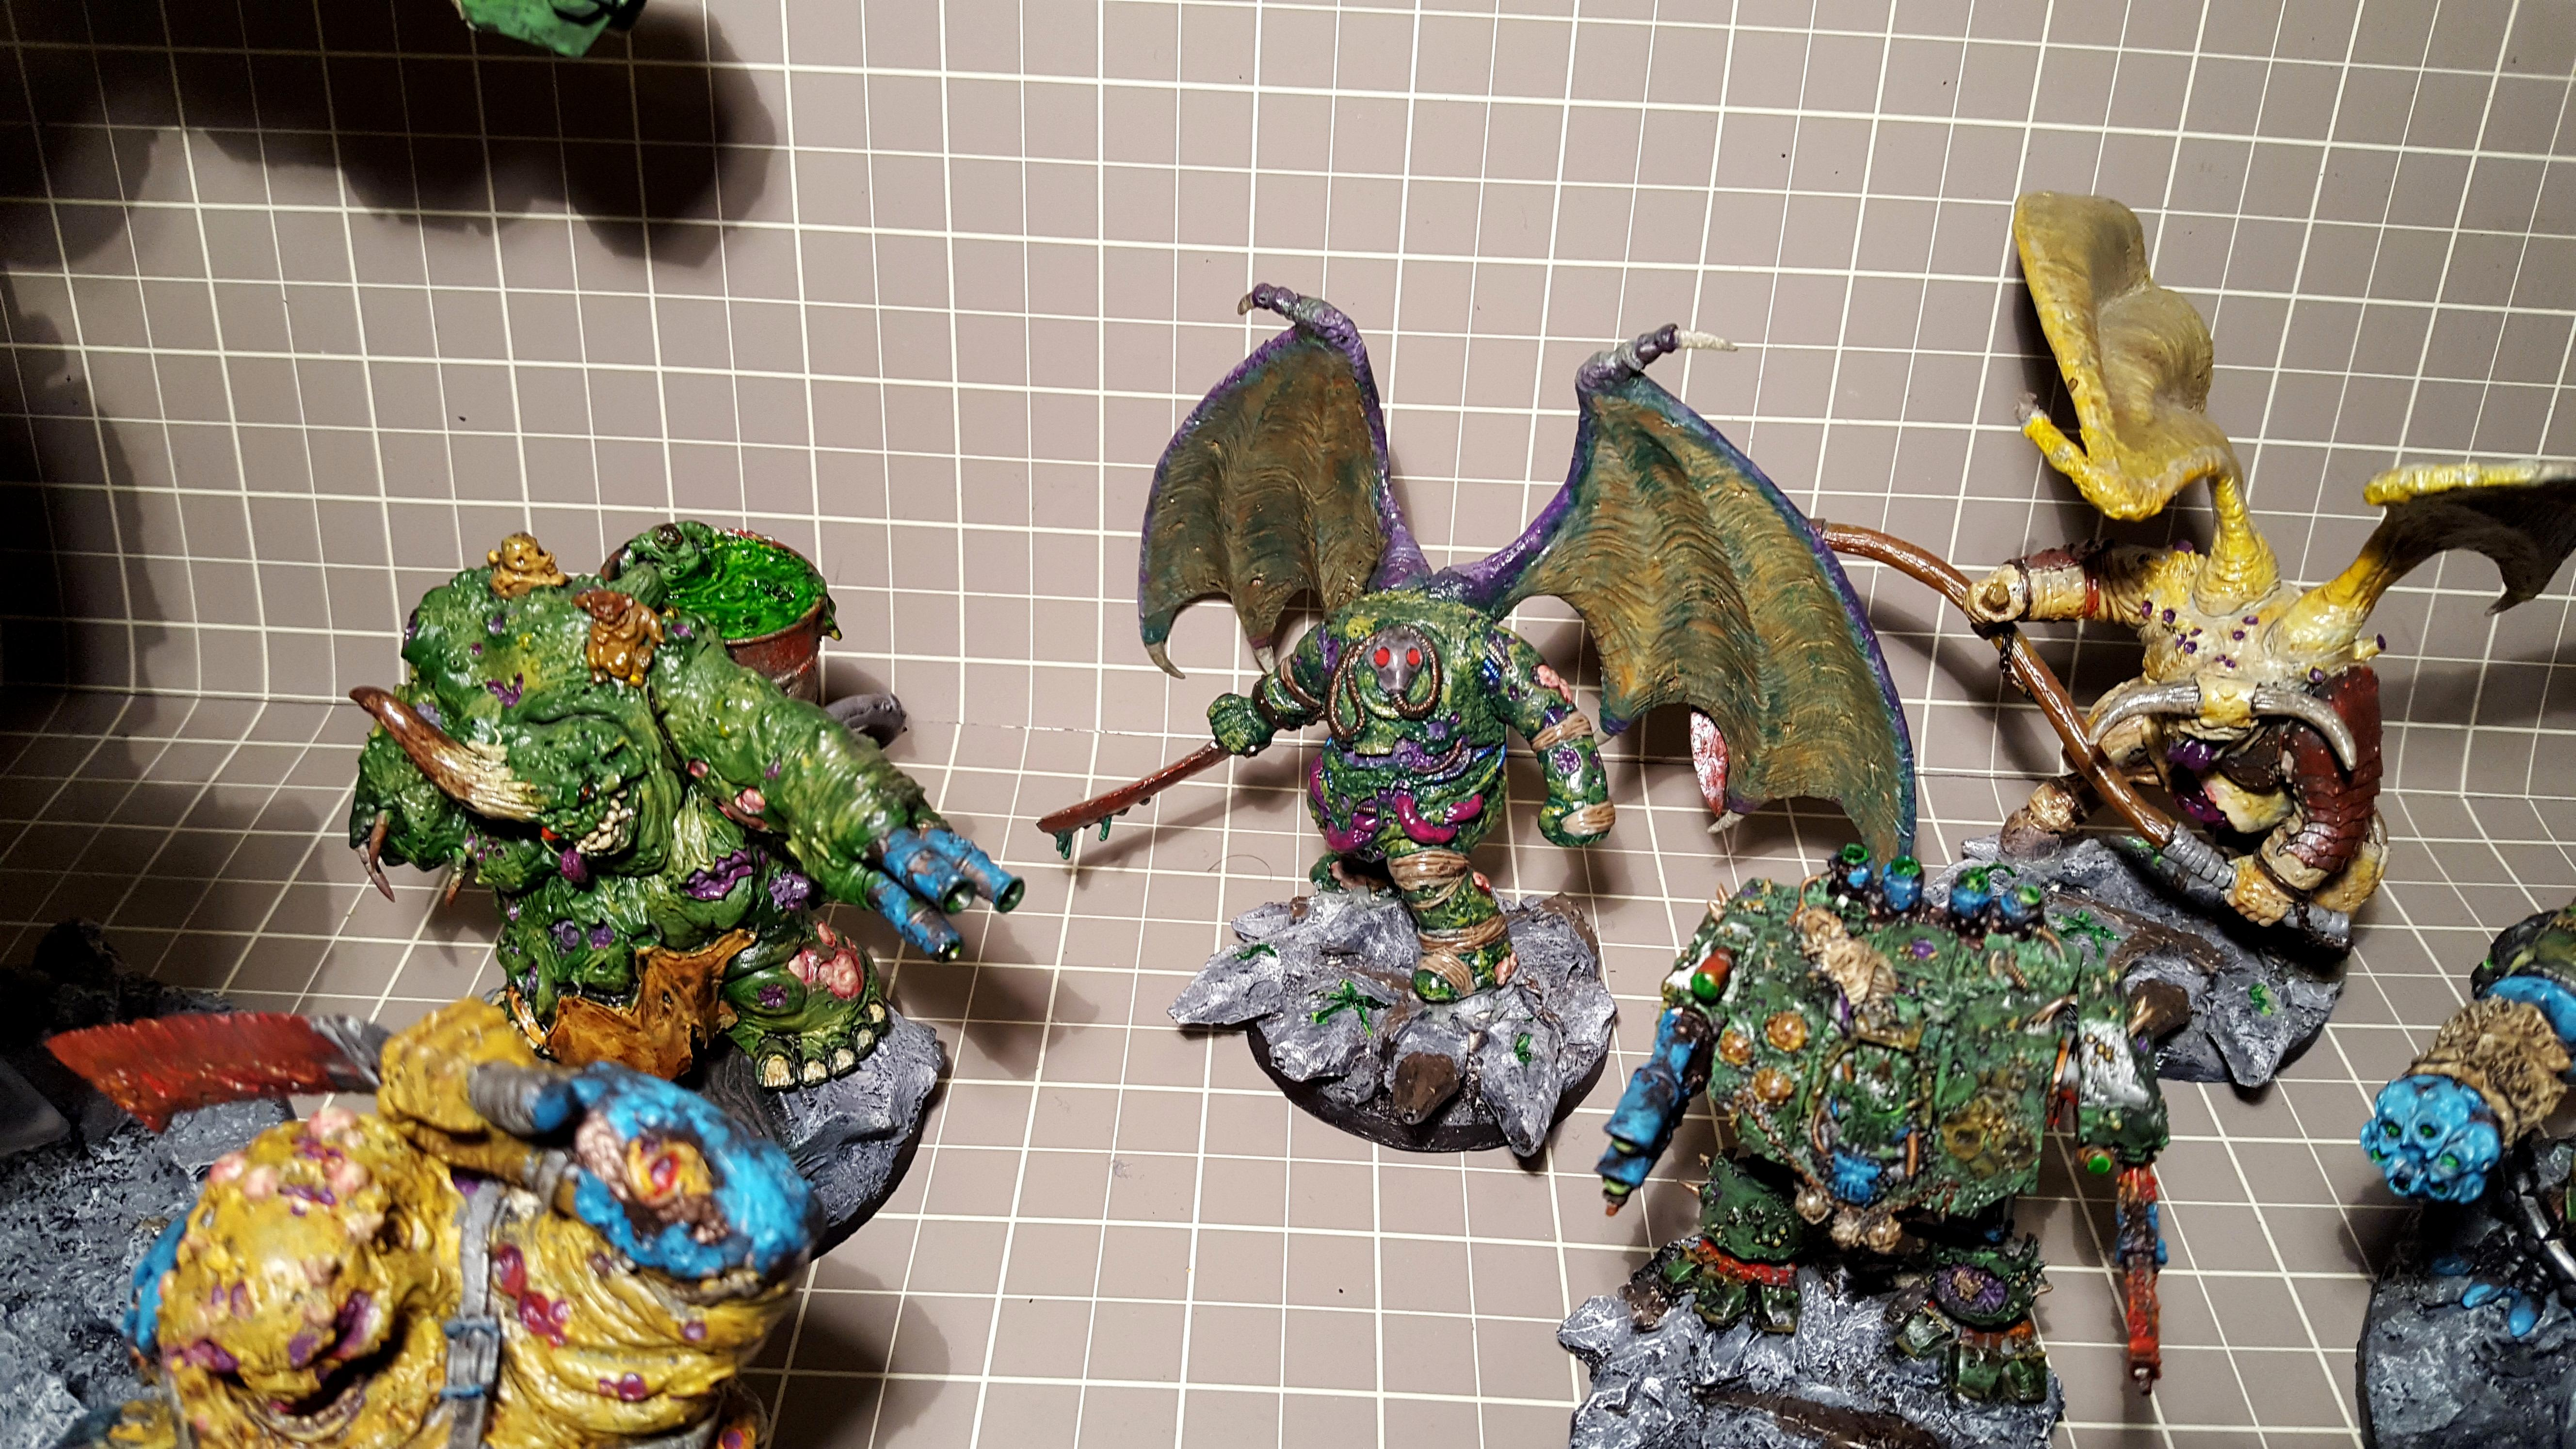 Chaos, Death Guard, Forge World, Nurgle, Warhammer 40,000